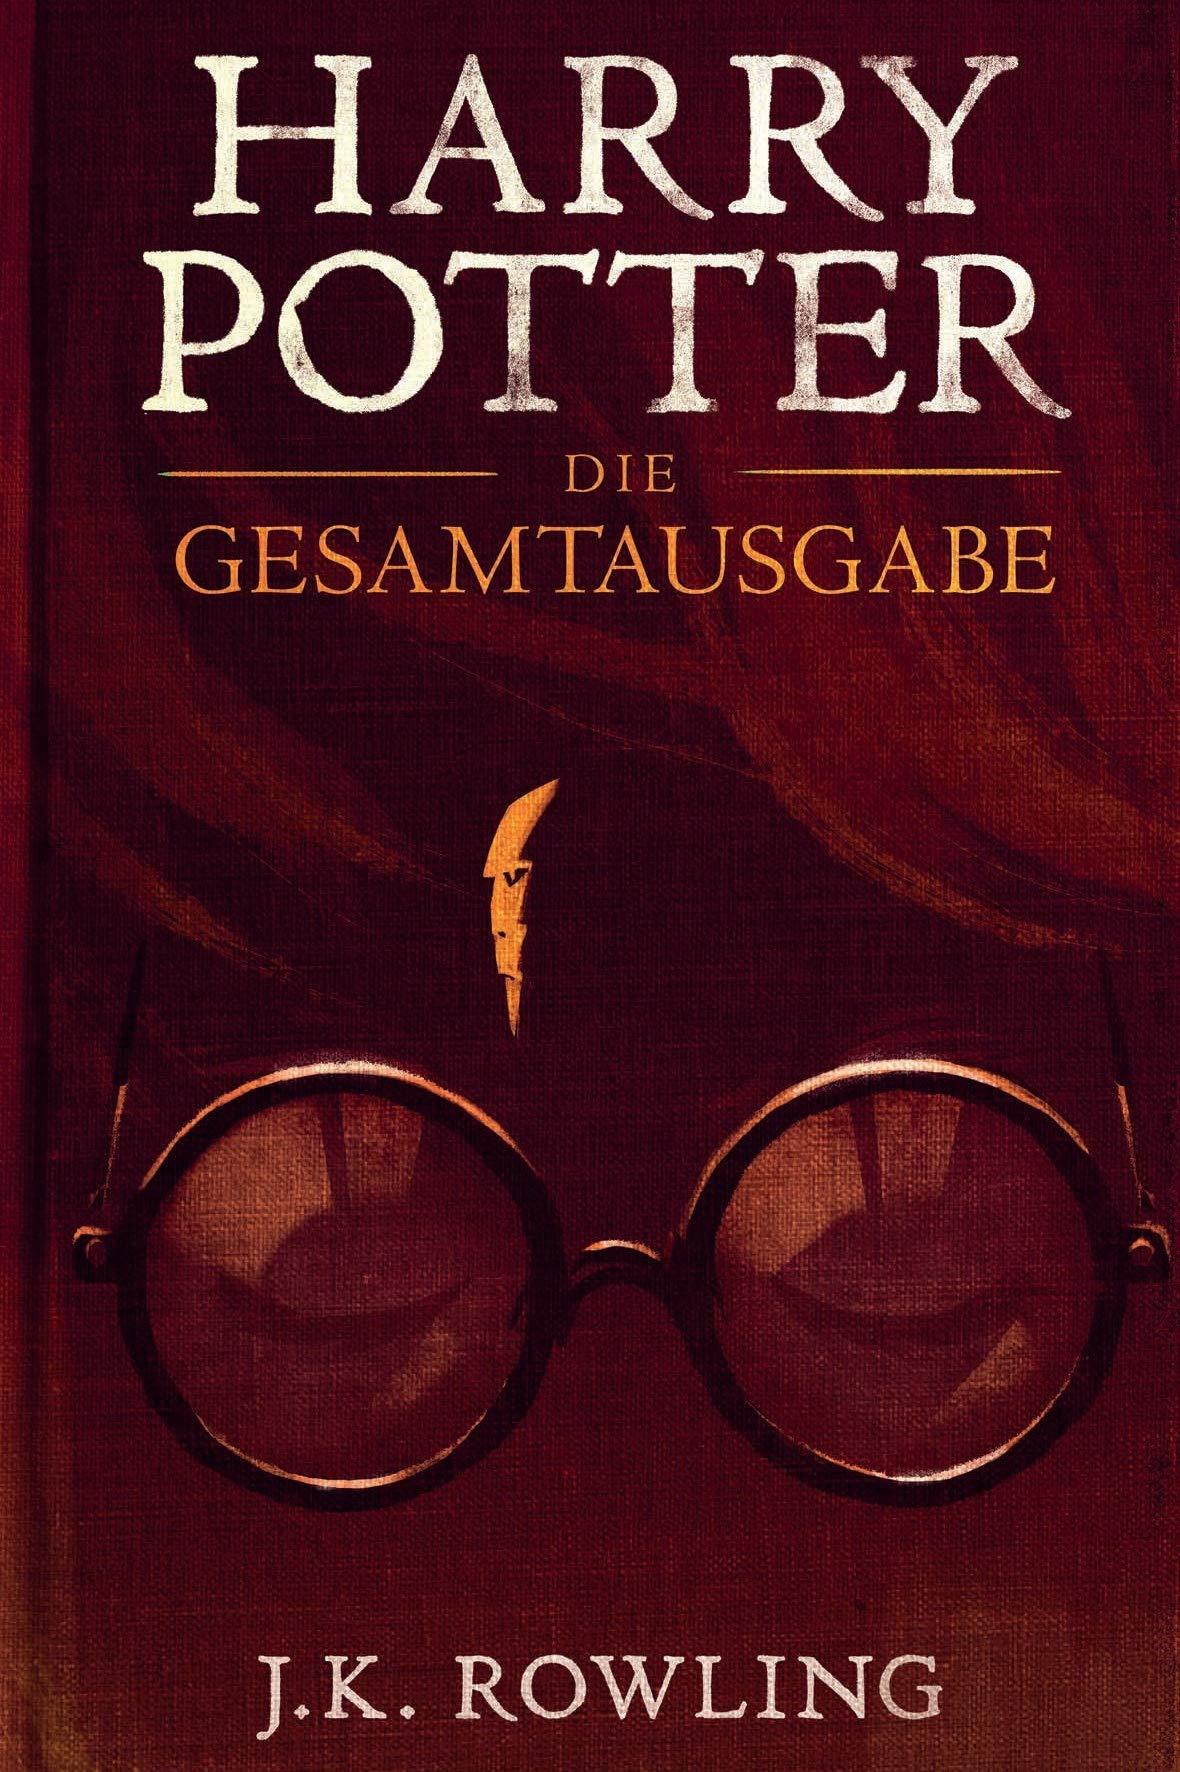 Amazon Com Harry Potter Die Gesamtausgabe 1 7 German Edition Ebook Rowling J K Carlsen Fritz Klaus Kindle Store